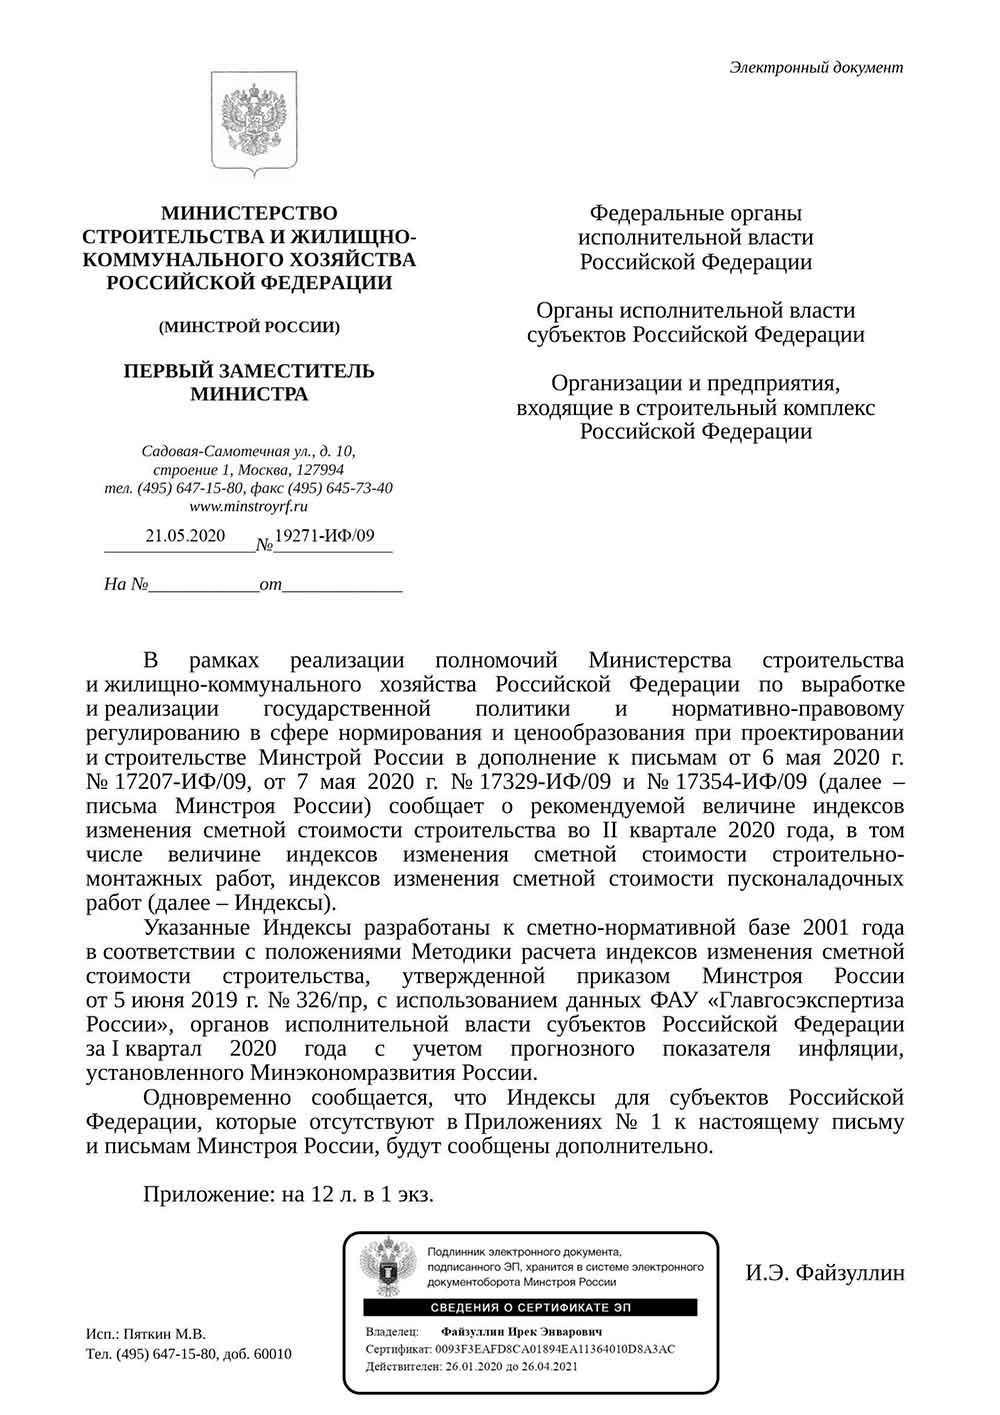 Письмо Минстроя РФ №19271-ИФ/09 от 21.05.2020 г.